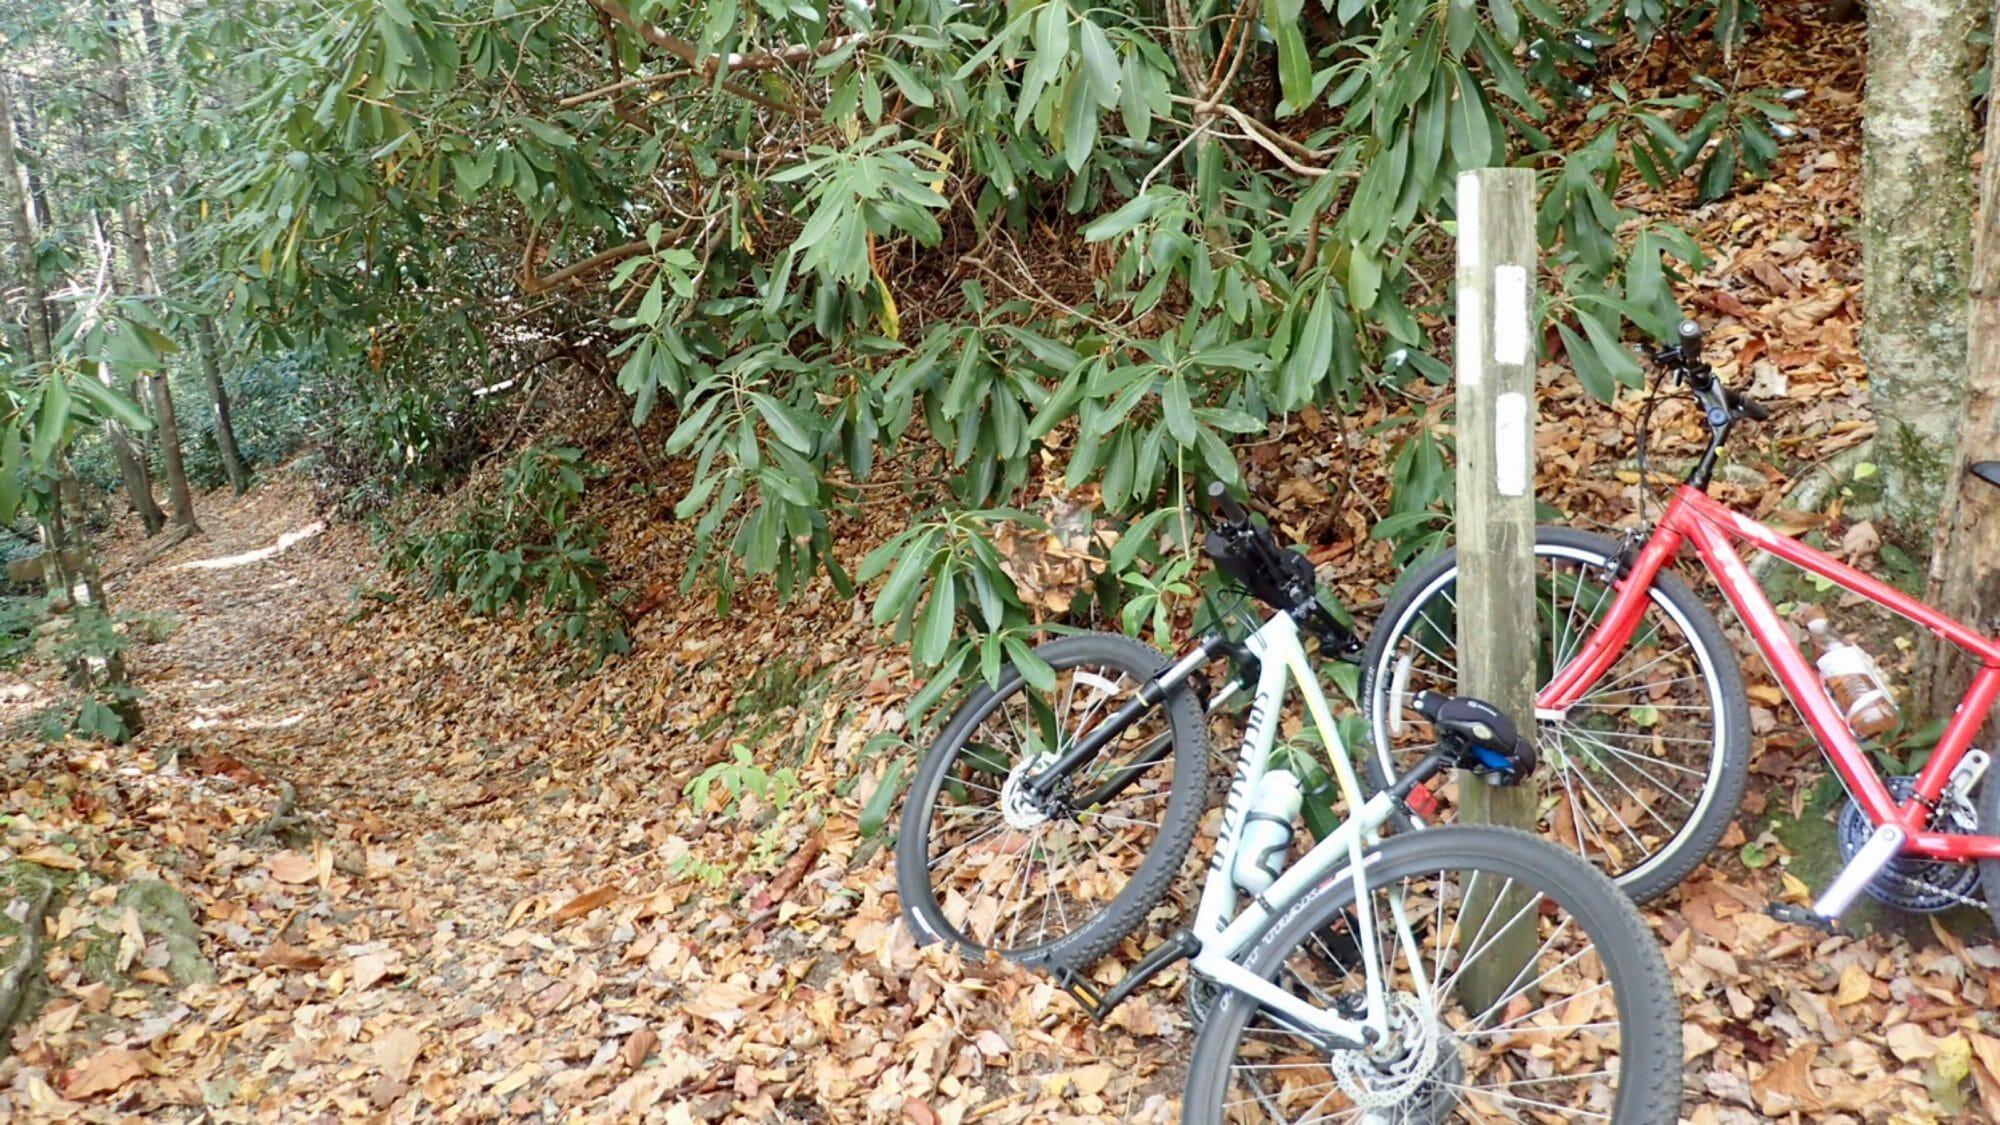 Southern Bikes & Hikes